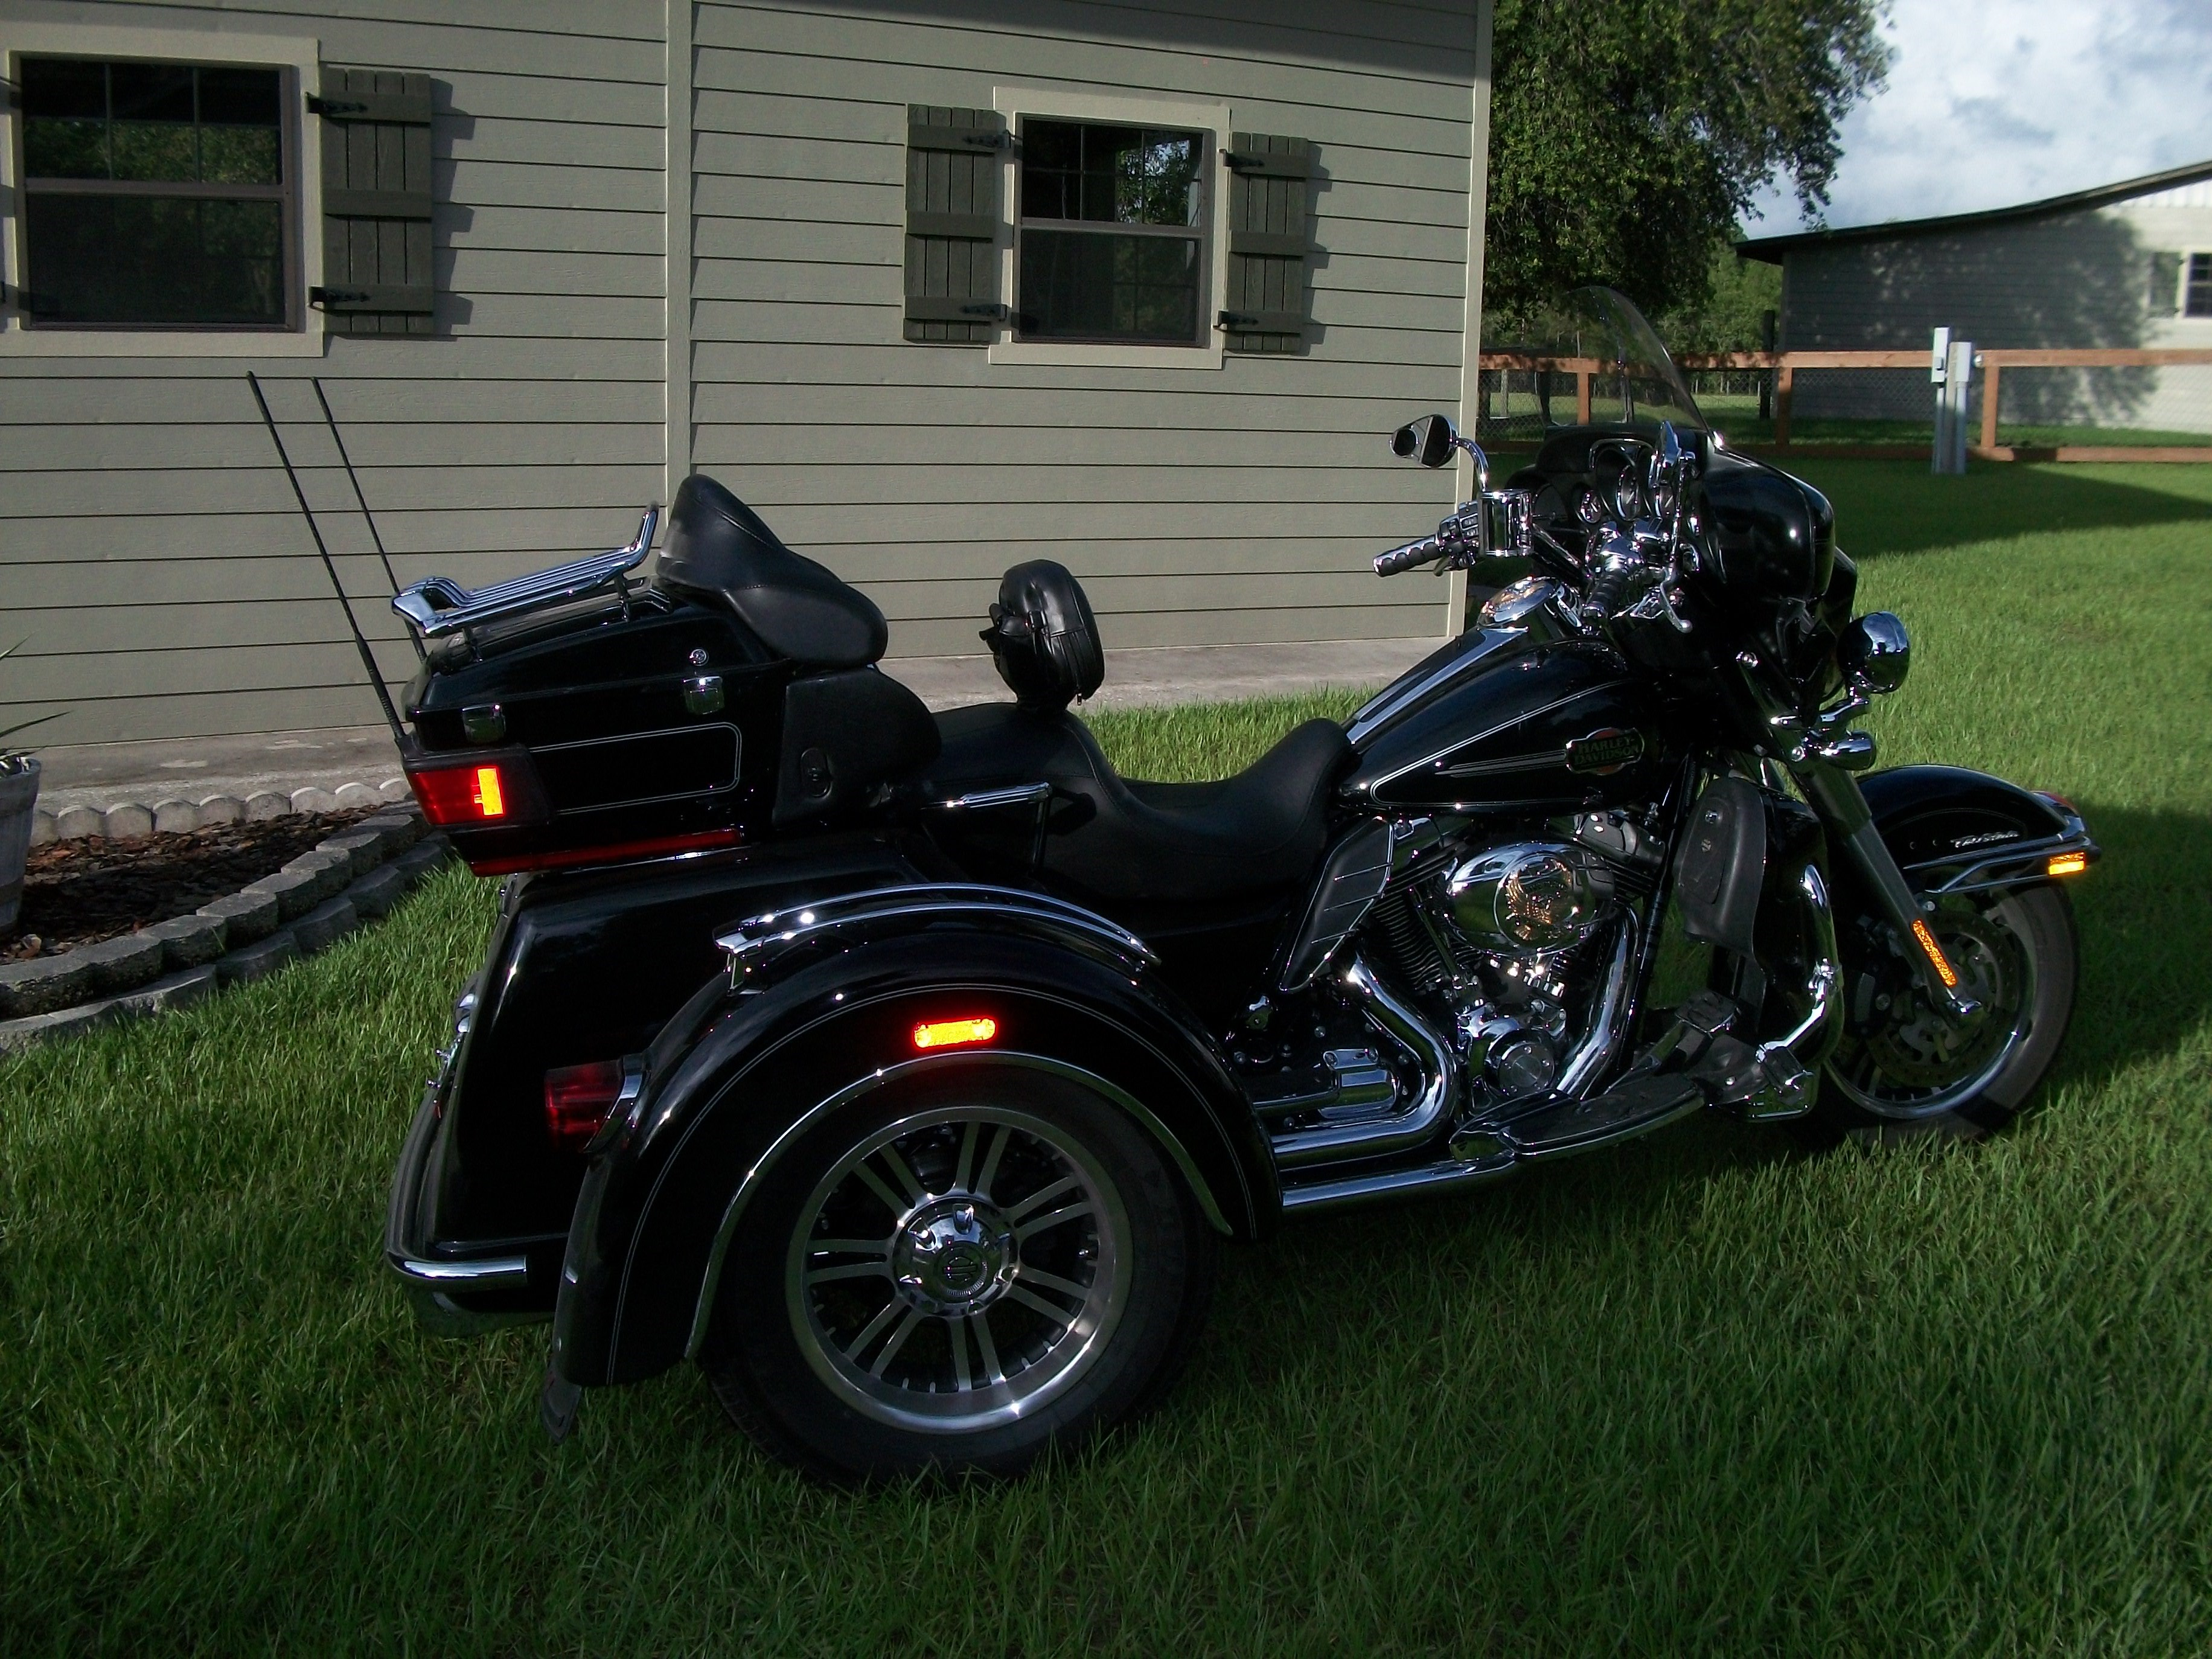 2012 Harley Davidson 174 Flhtcutg Tri Glide 174 Ultra Classic